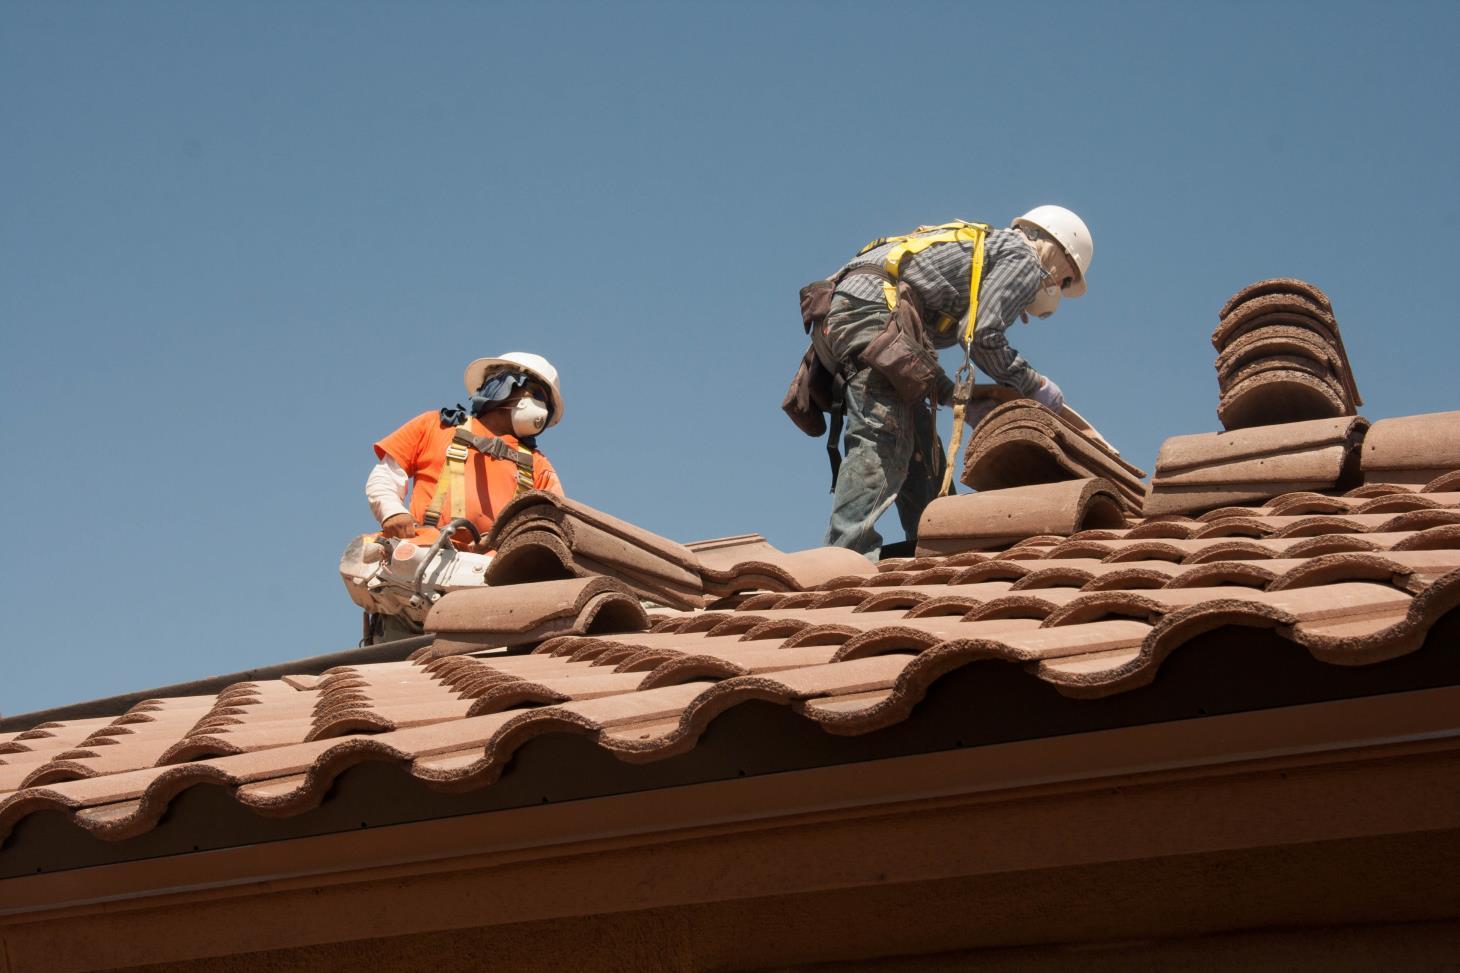 Jr Plumbing and Construction, LLC image 4